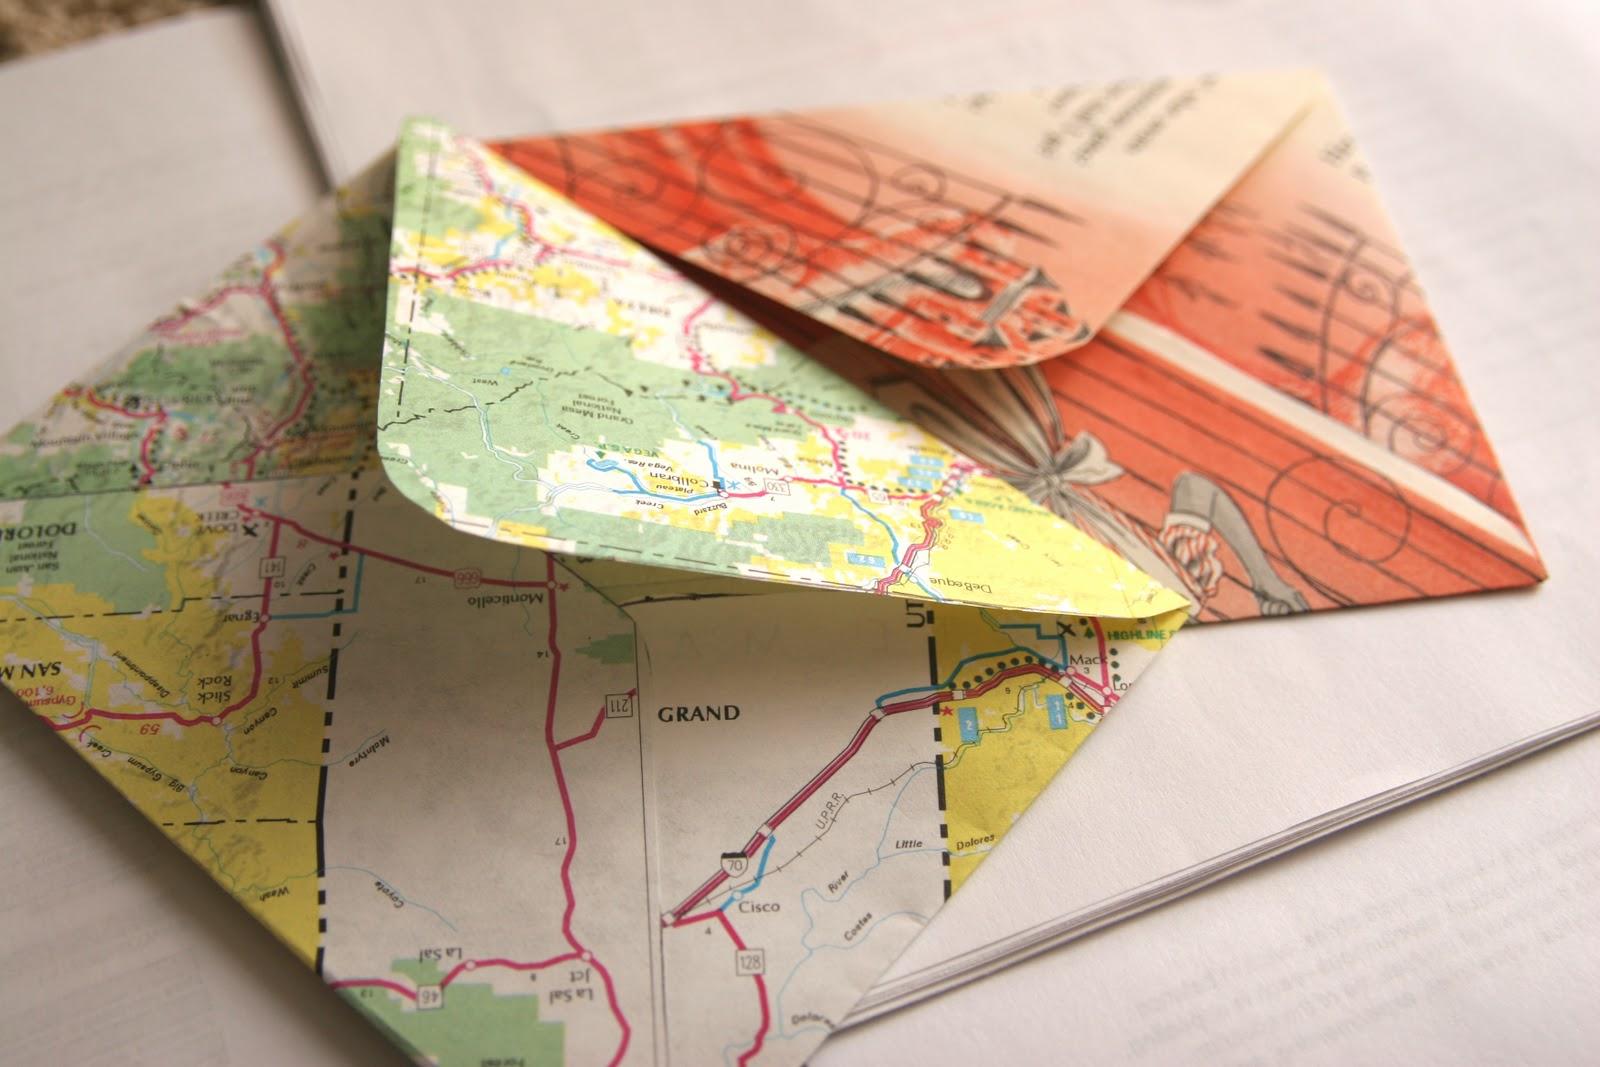 Scrapbook paper envelope - Indoor Activities Day 11 Handmade Recycled Cards Envelopes